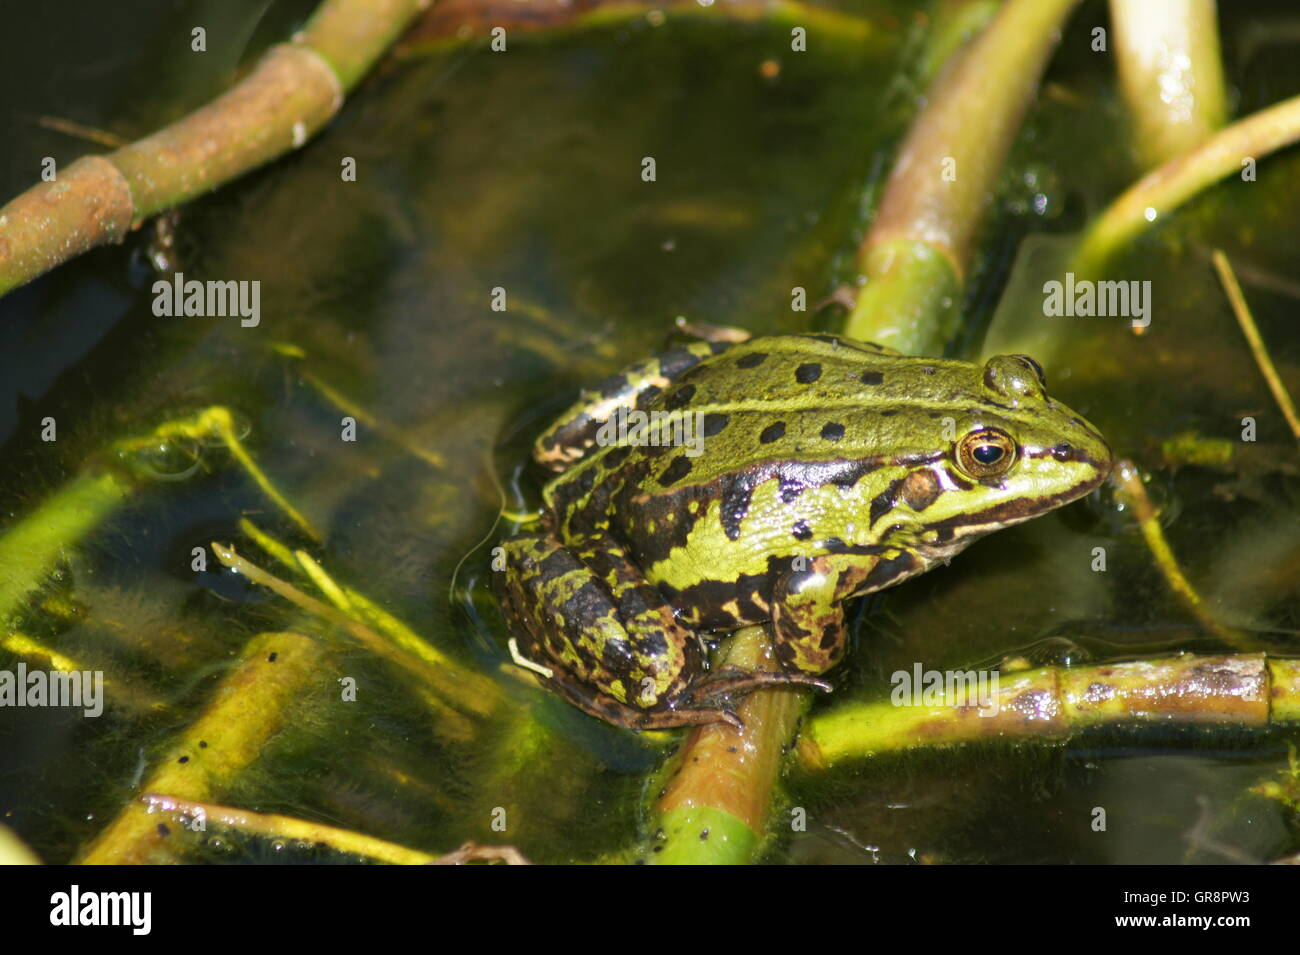 Pond Frog Pelophylax Kl. Esculentus - Stock Image